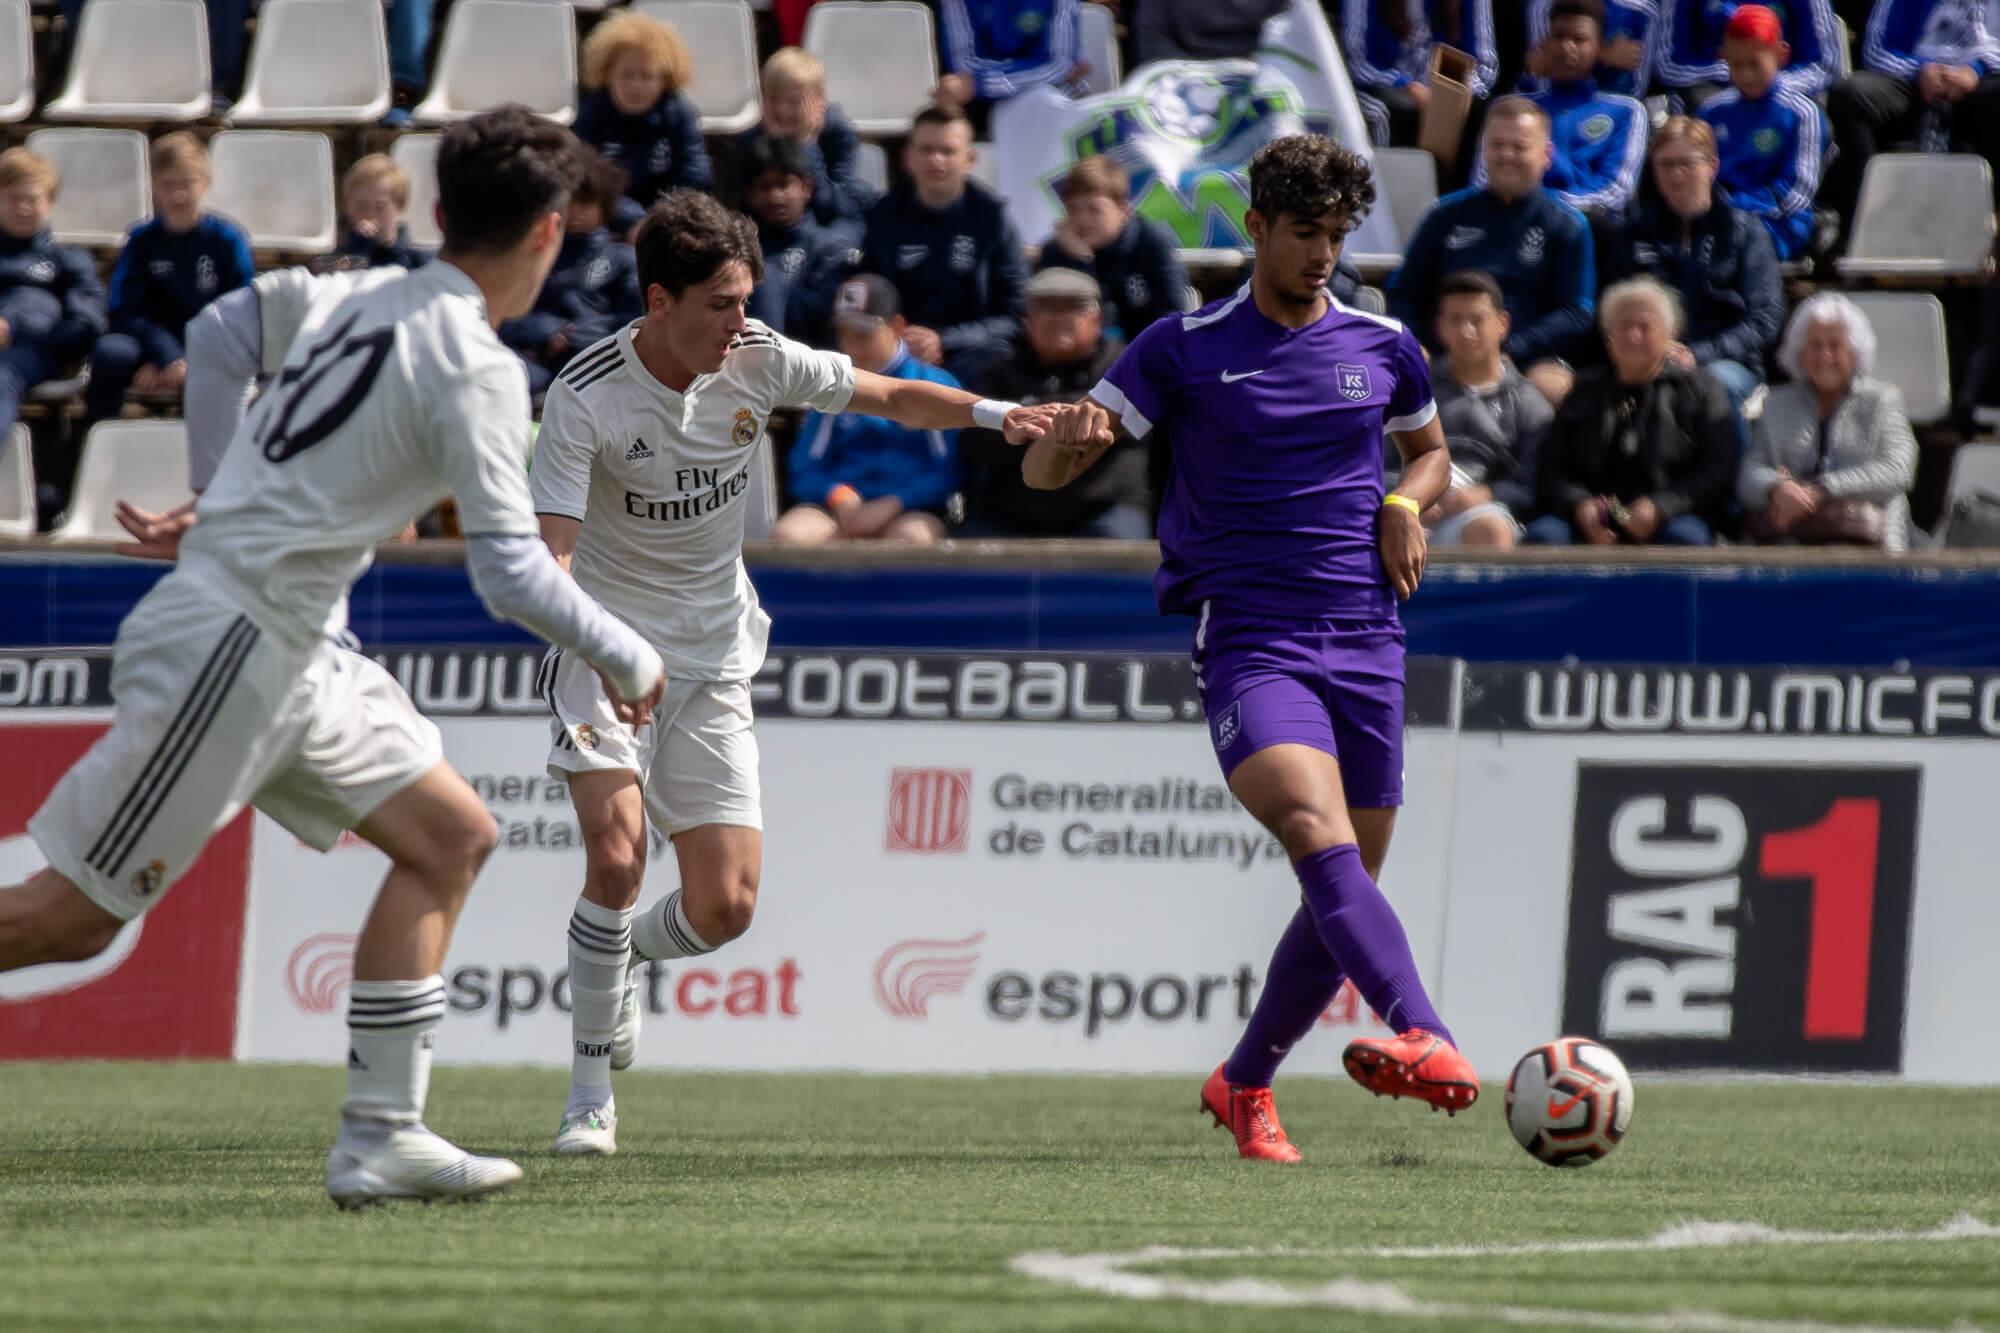 football development in Madrid